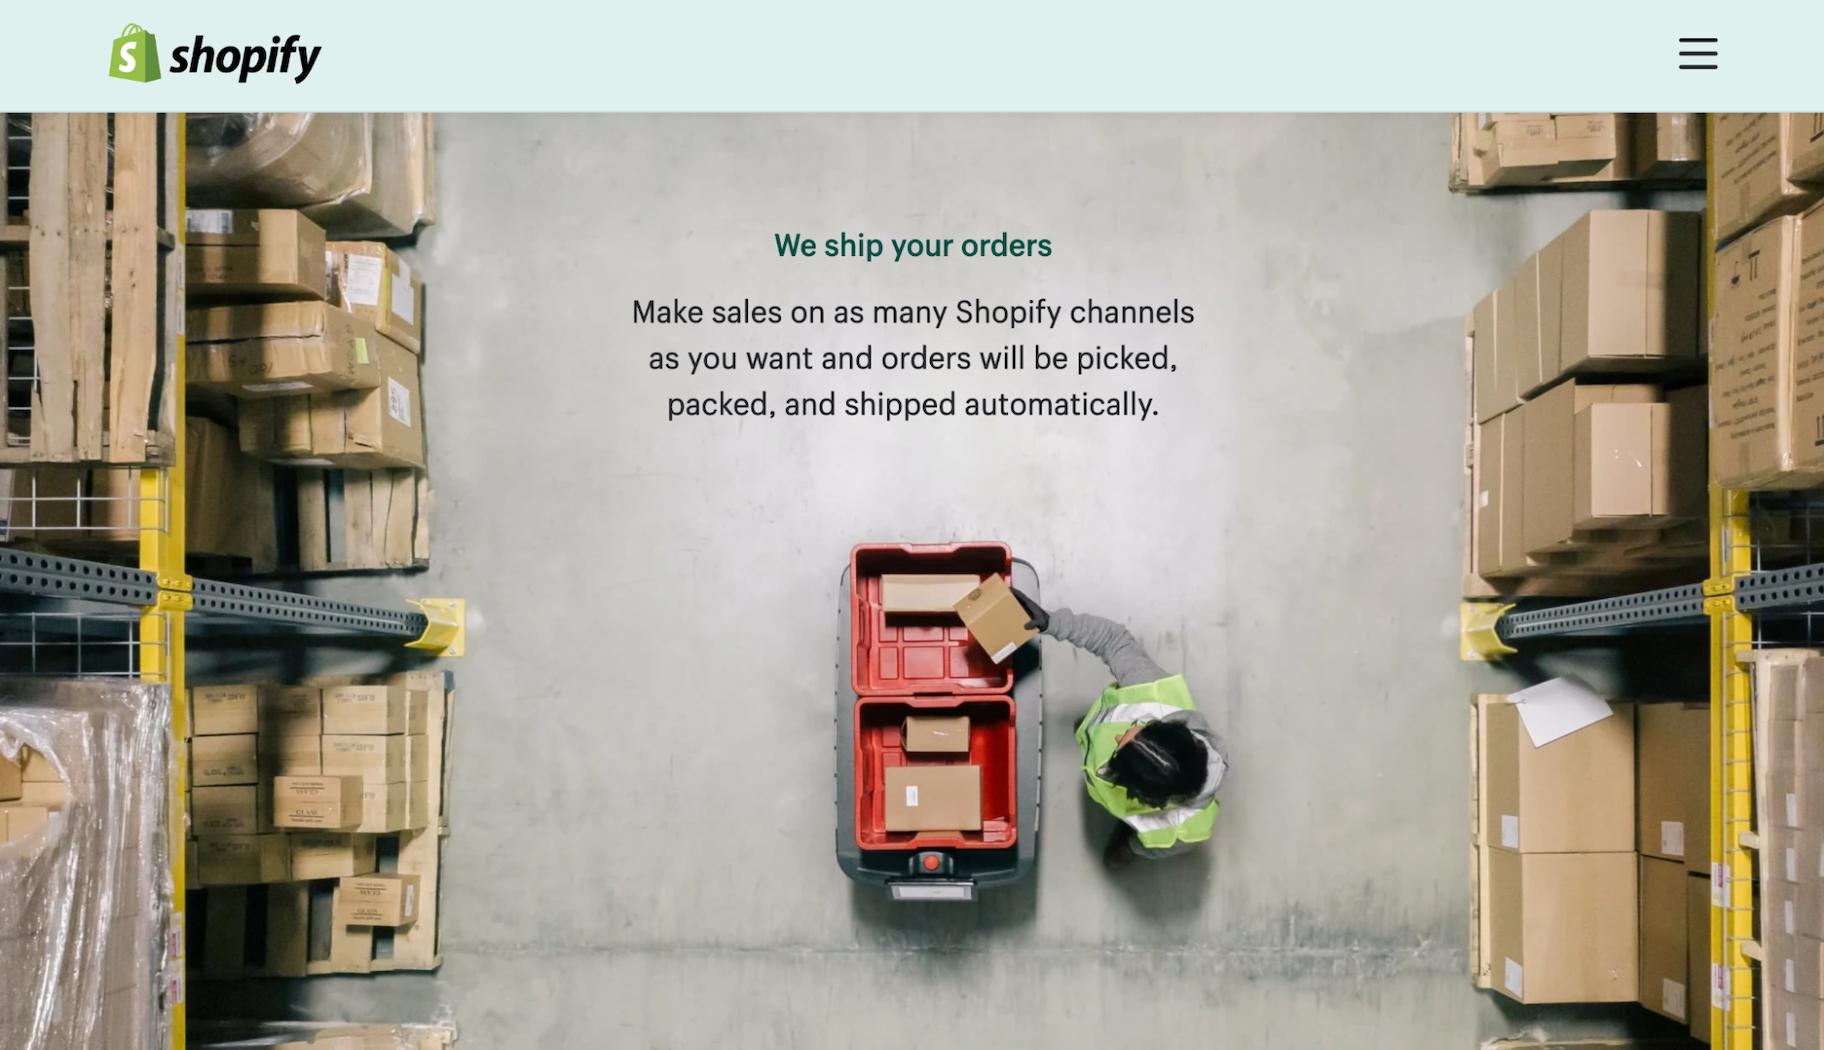 Shopify Fulfillment Network